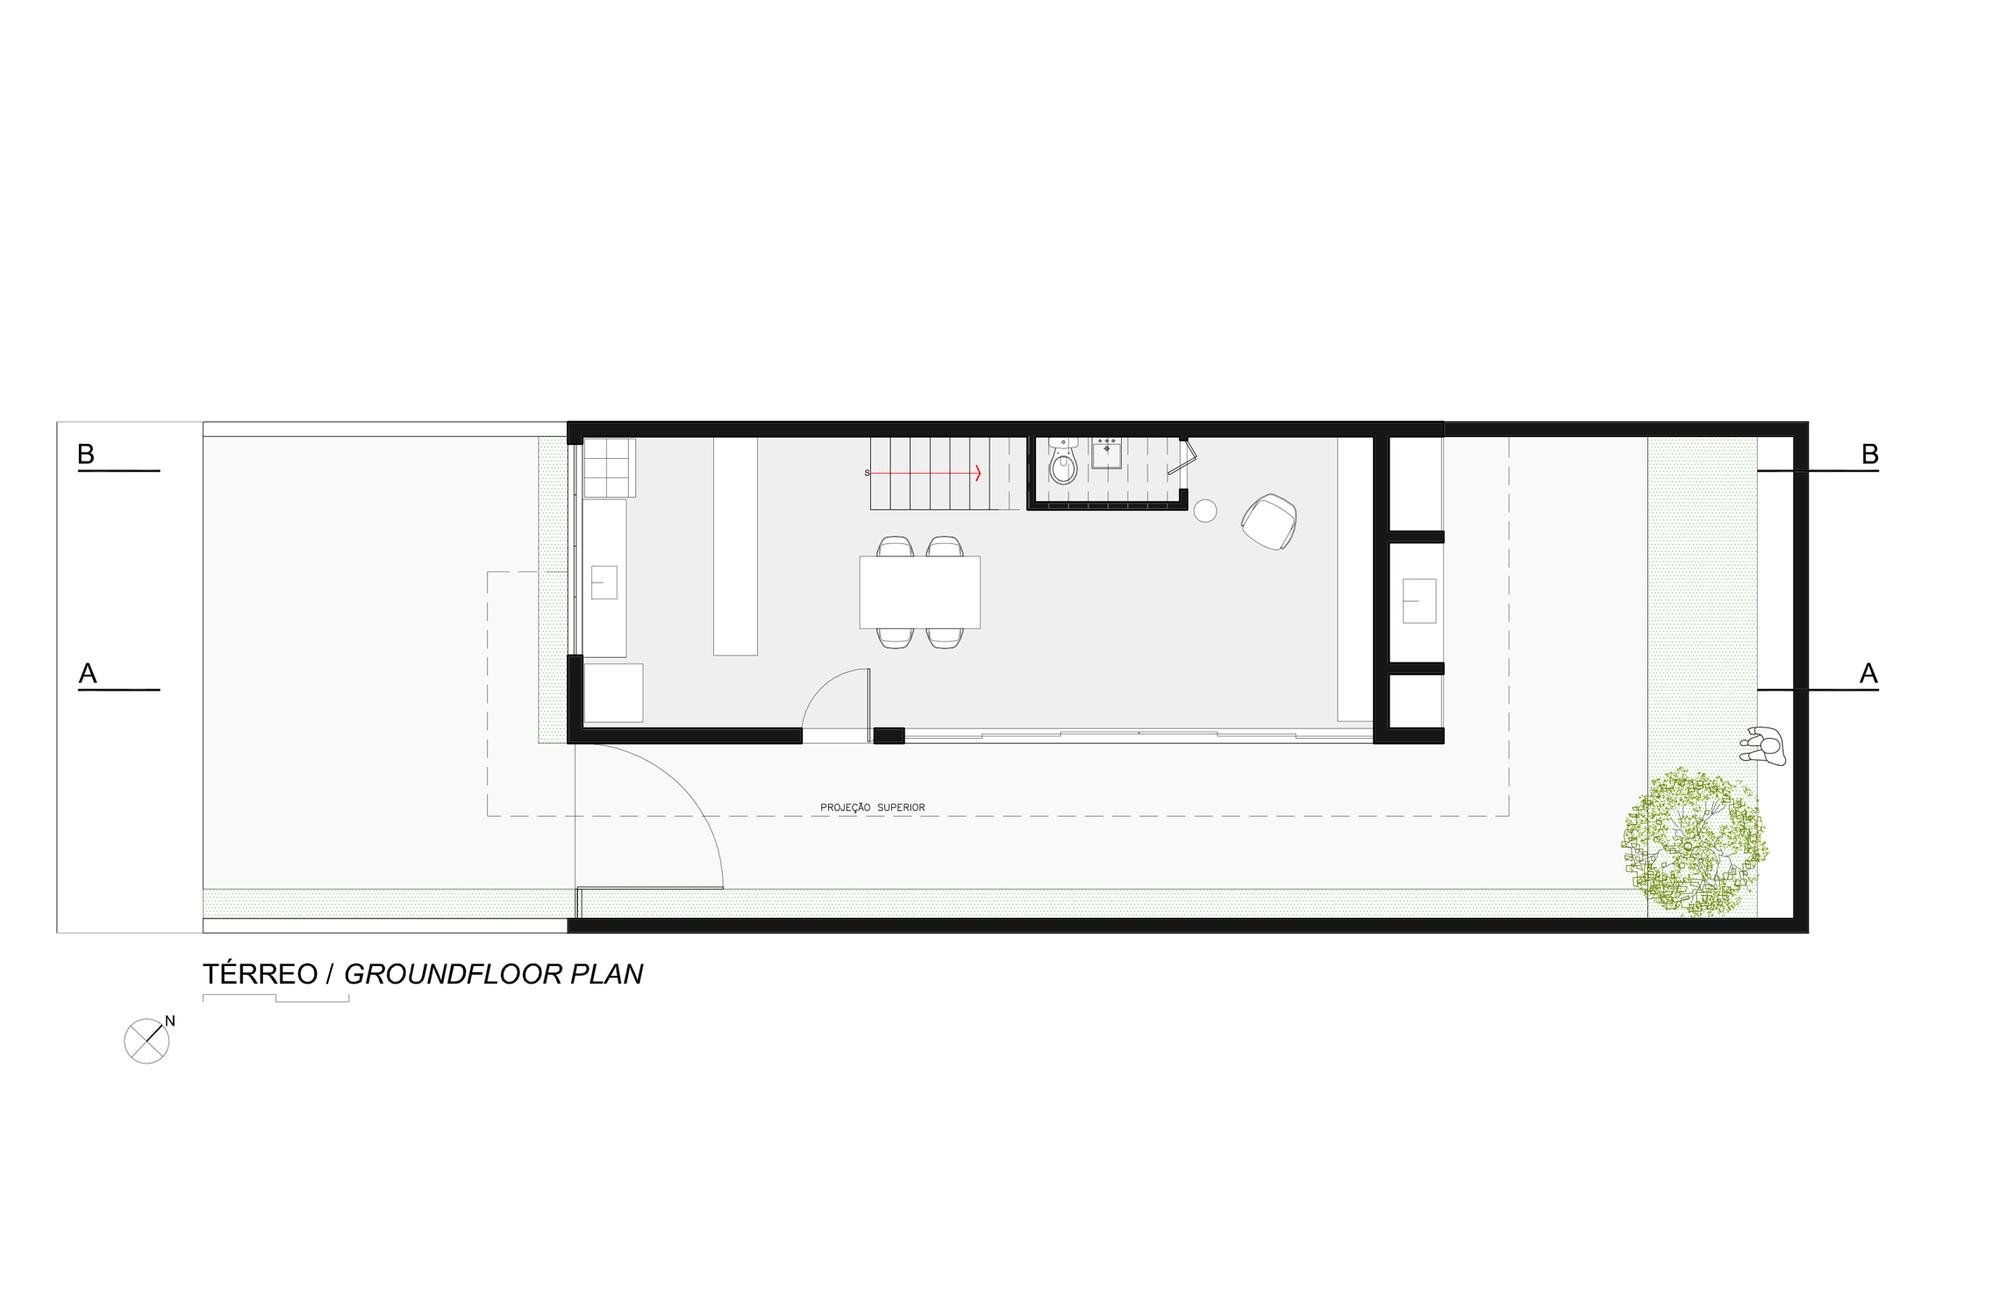 Galeria de casa sorocaba estudio bra arquitetura 34 for Casa minimalista de 6 x 20